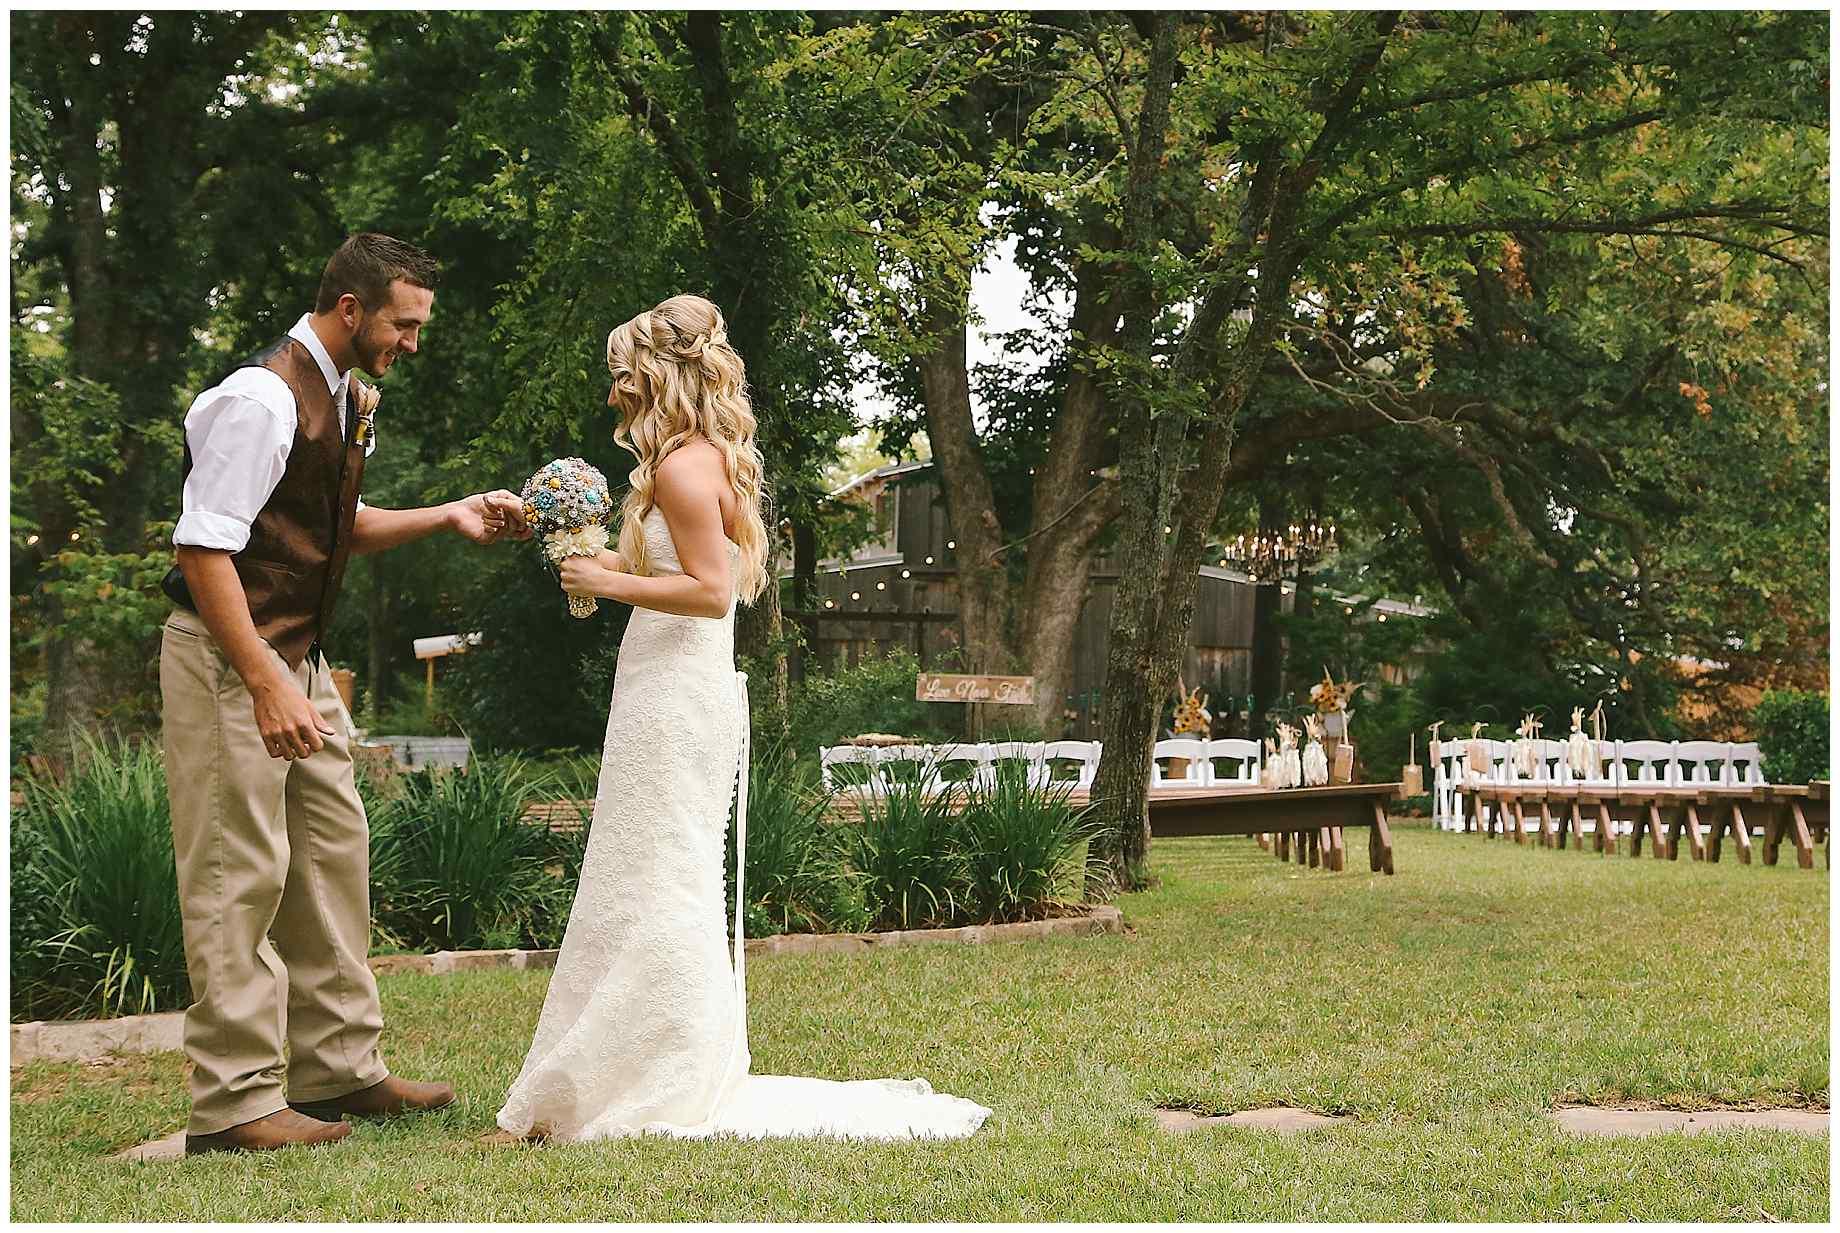 stone-oak-ranch-outdoor-wedding-009